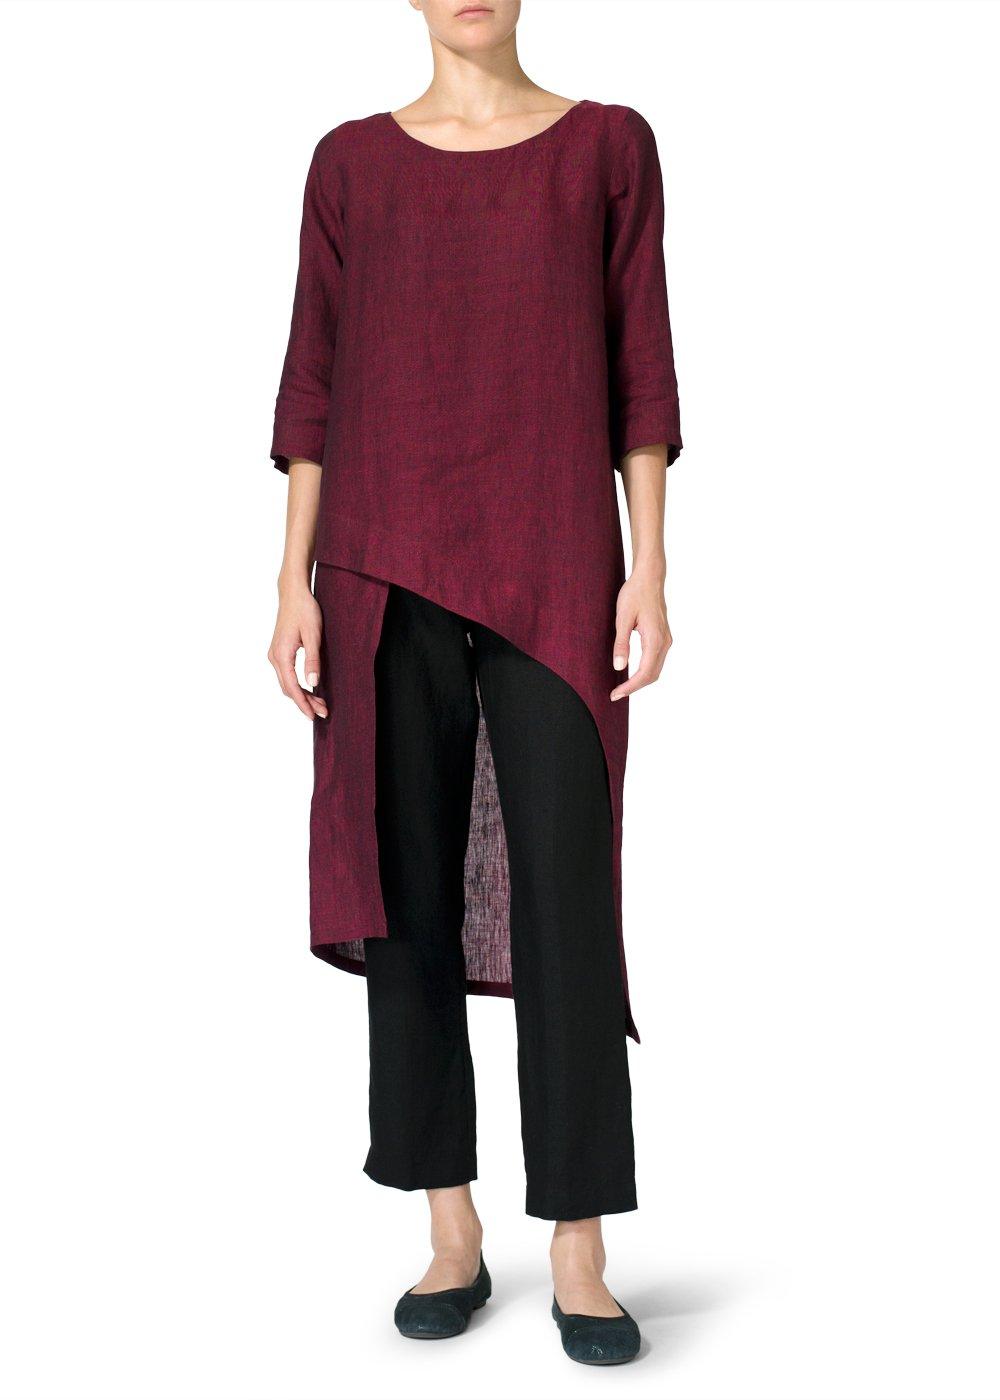 Vivid Linen Asymmetrical Tunic-S-Dark Burgundy